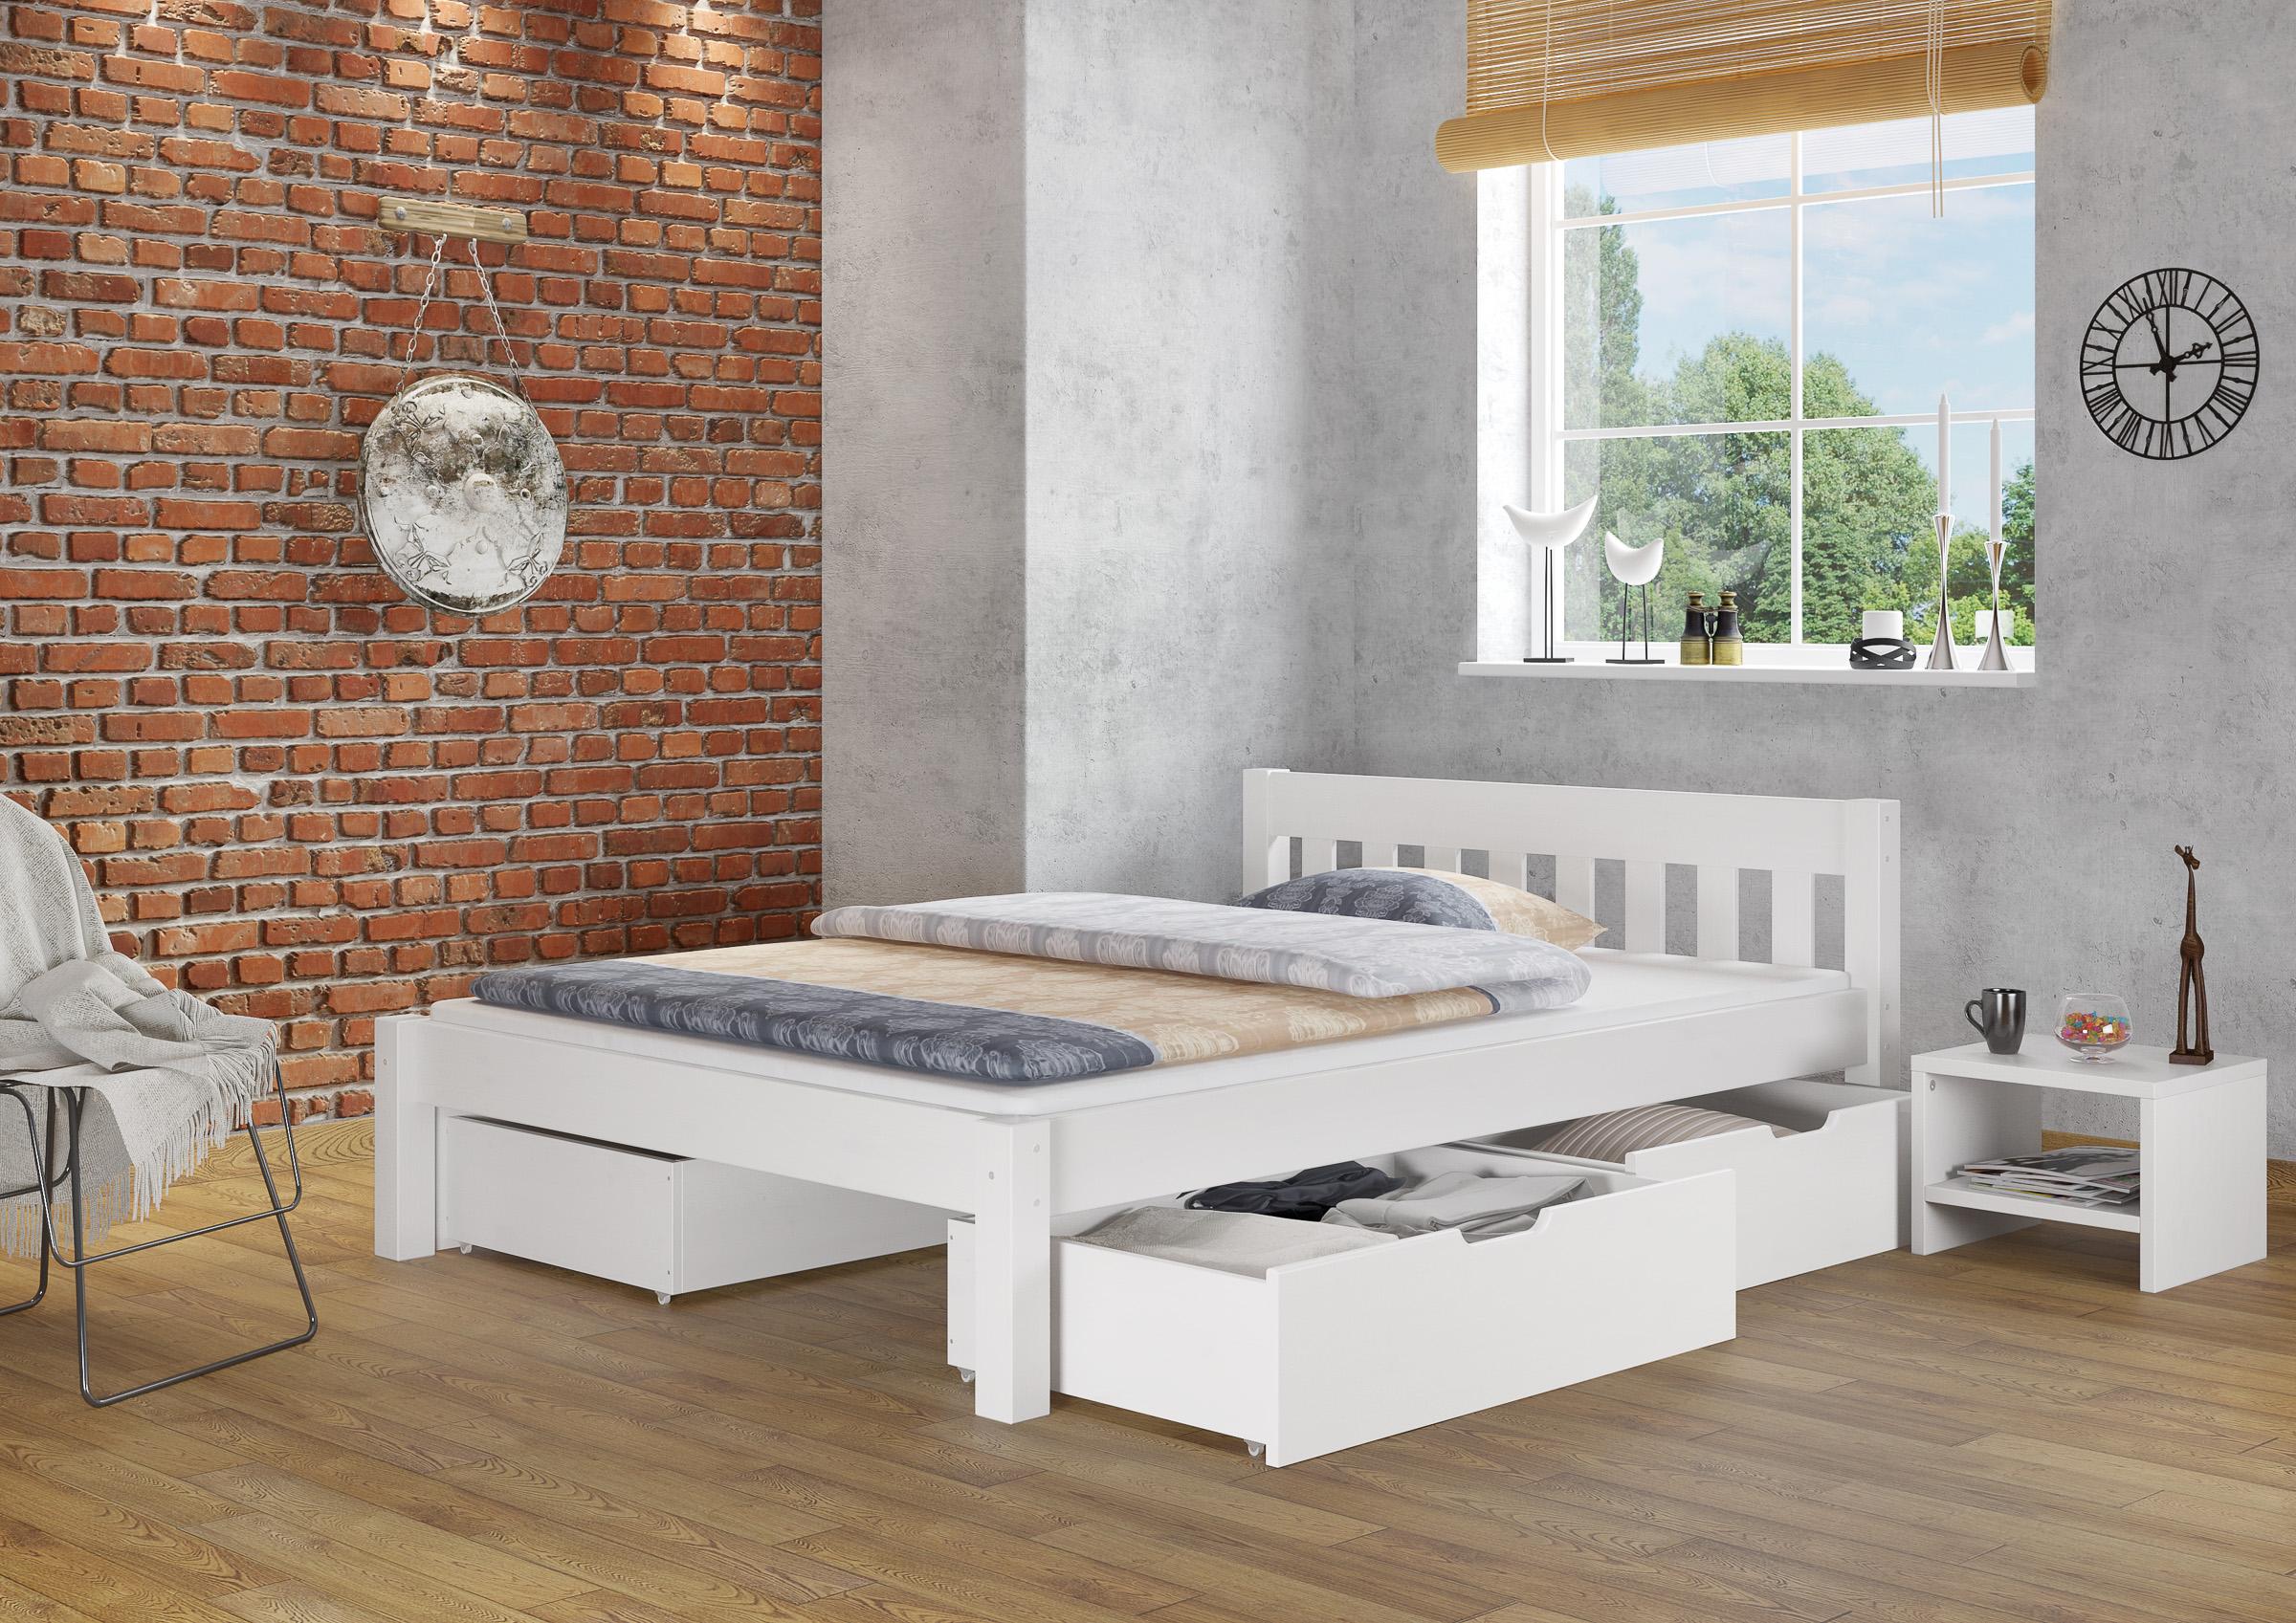 bett bettgestell wei kiefer massiv 140x200 cm futon o. Black Bedroom Furniture Sets. Home Design Ideas